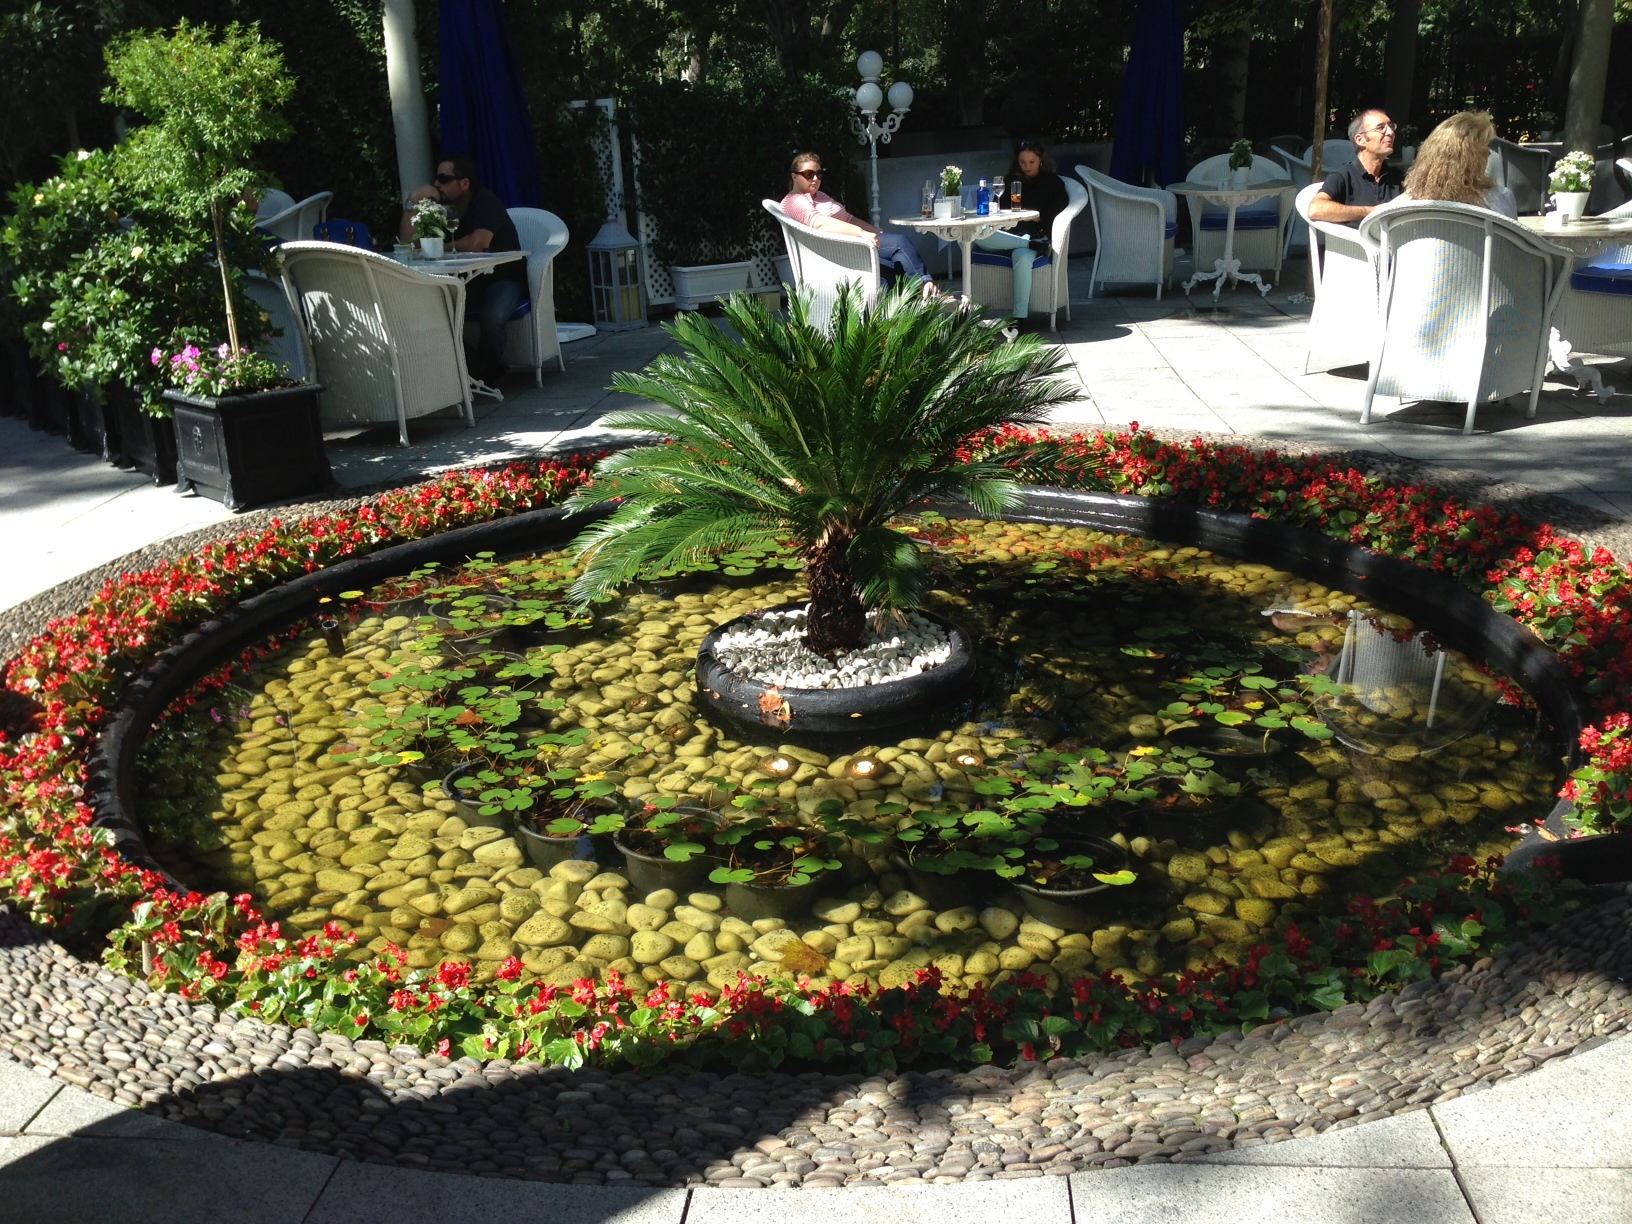 2012-12-04-Ritzgarden.JPG